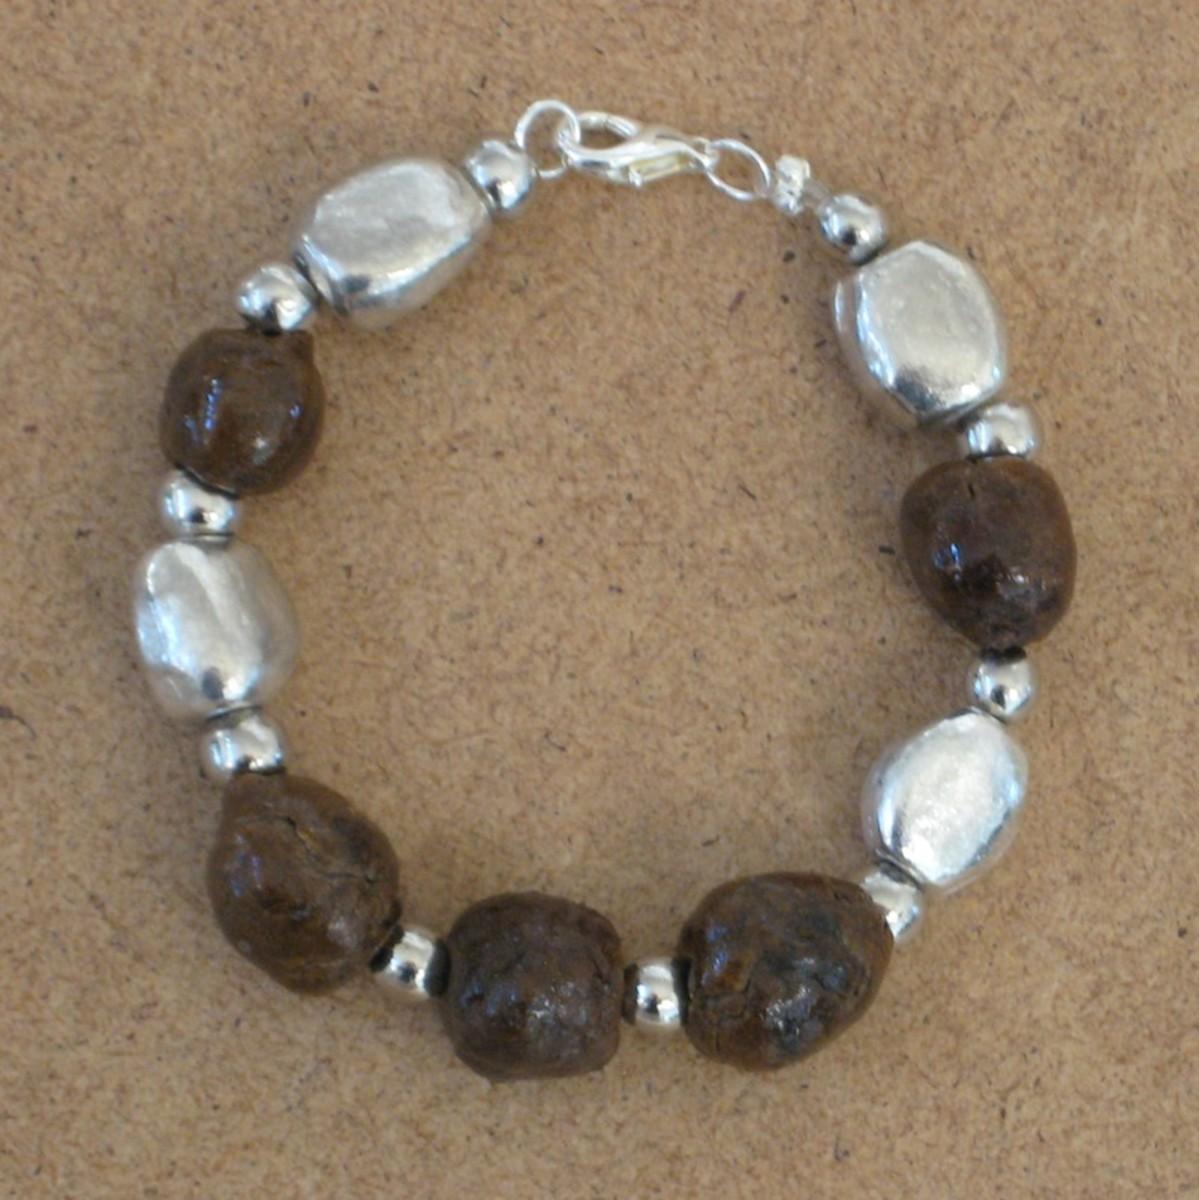 Rose petal bead bracelet by KT